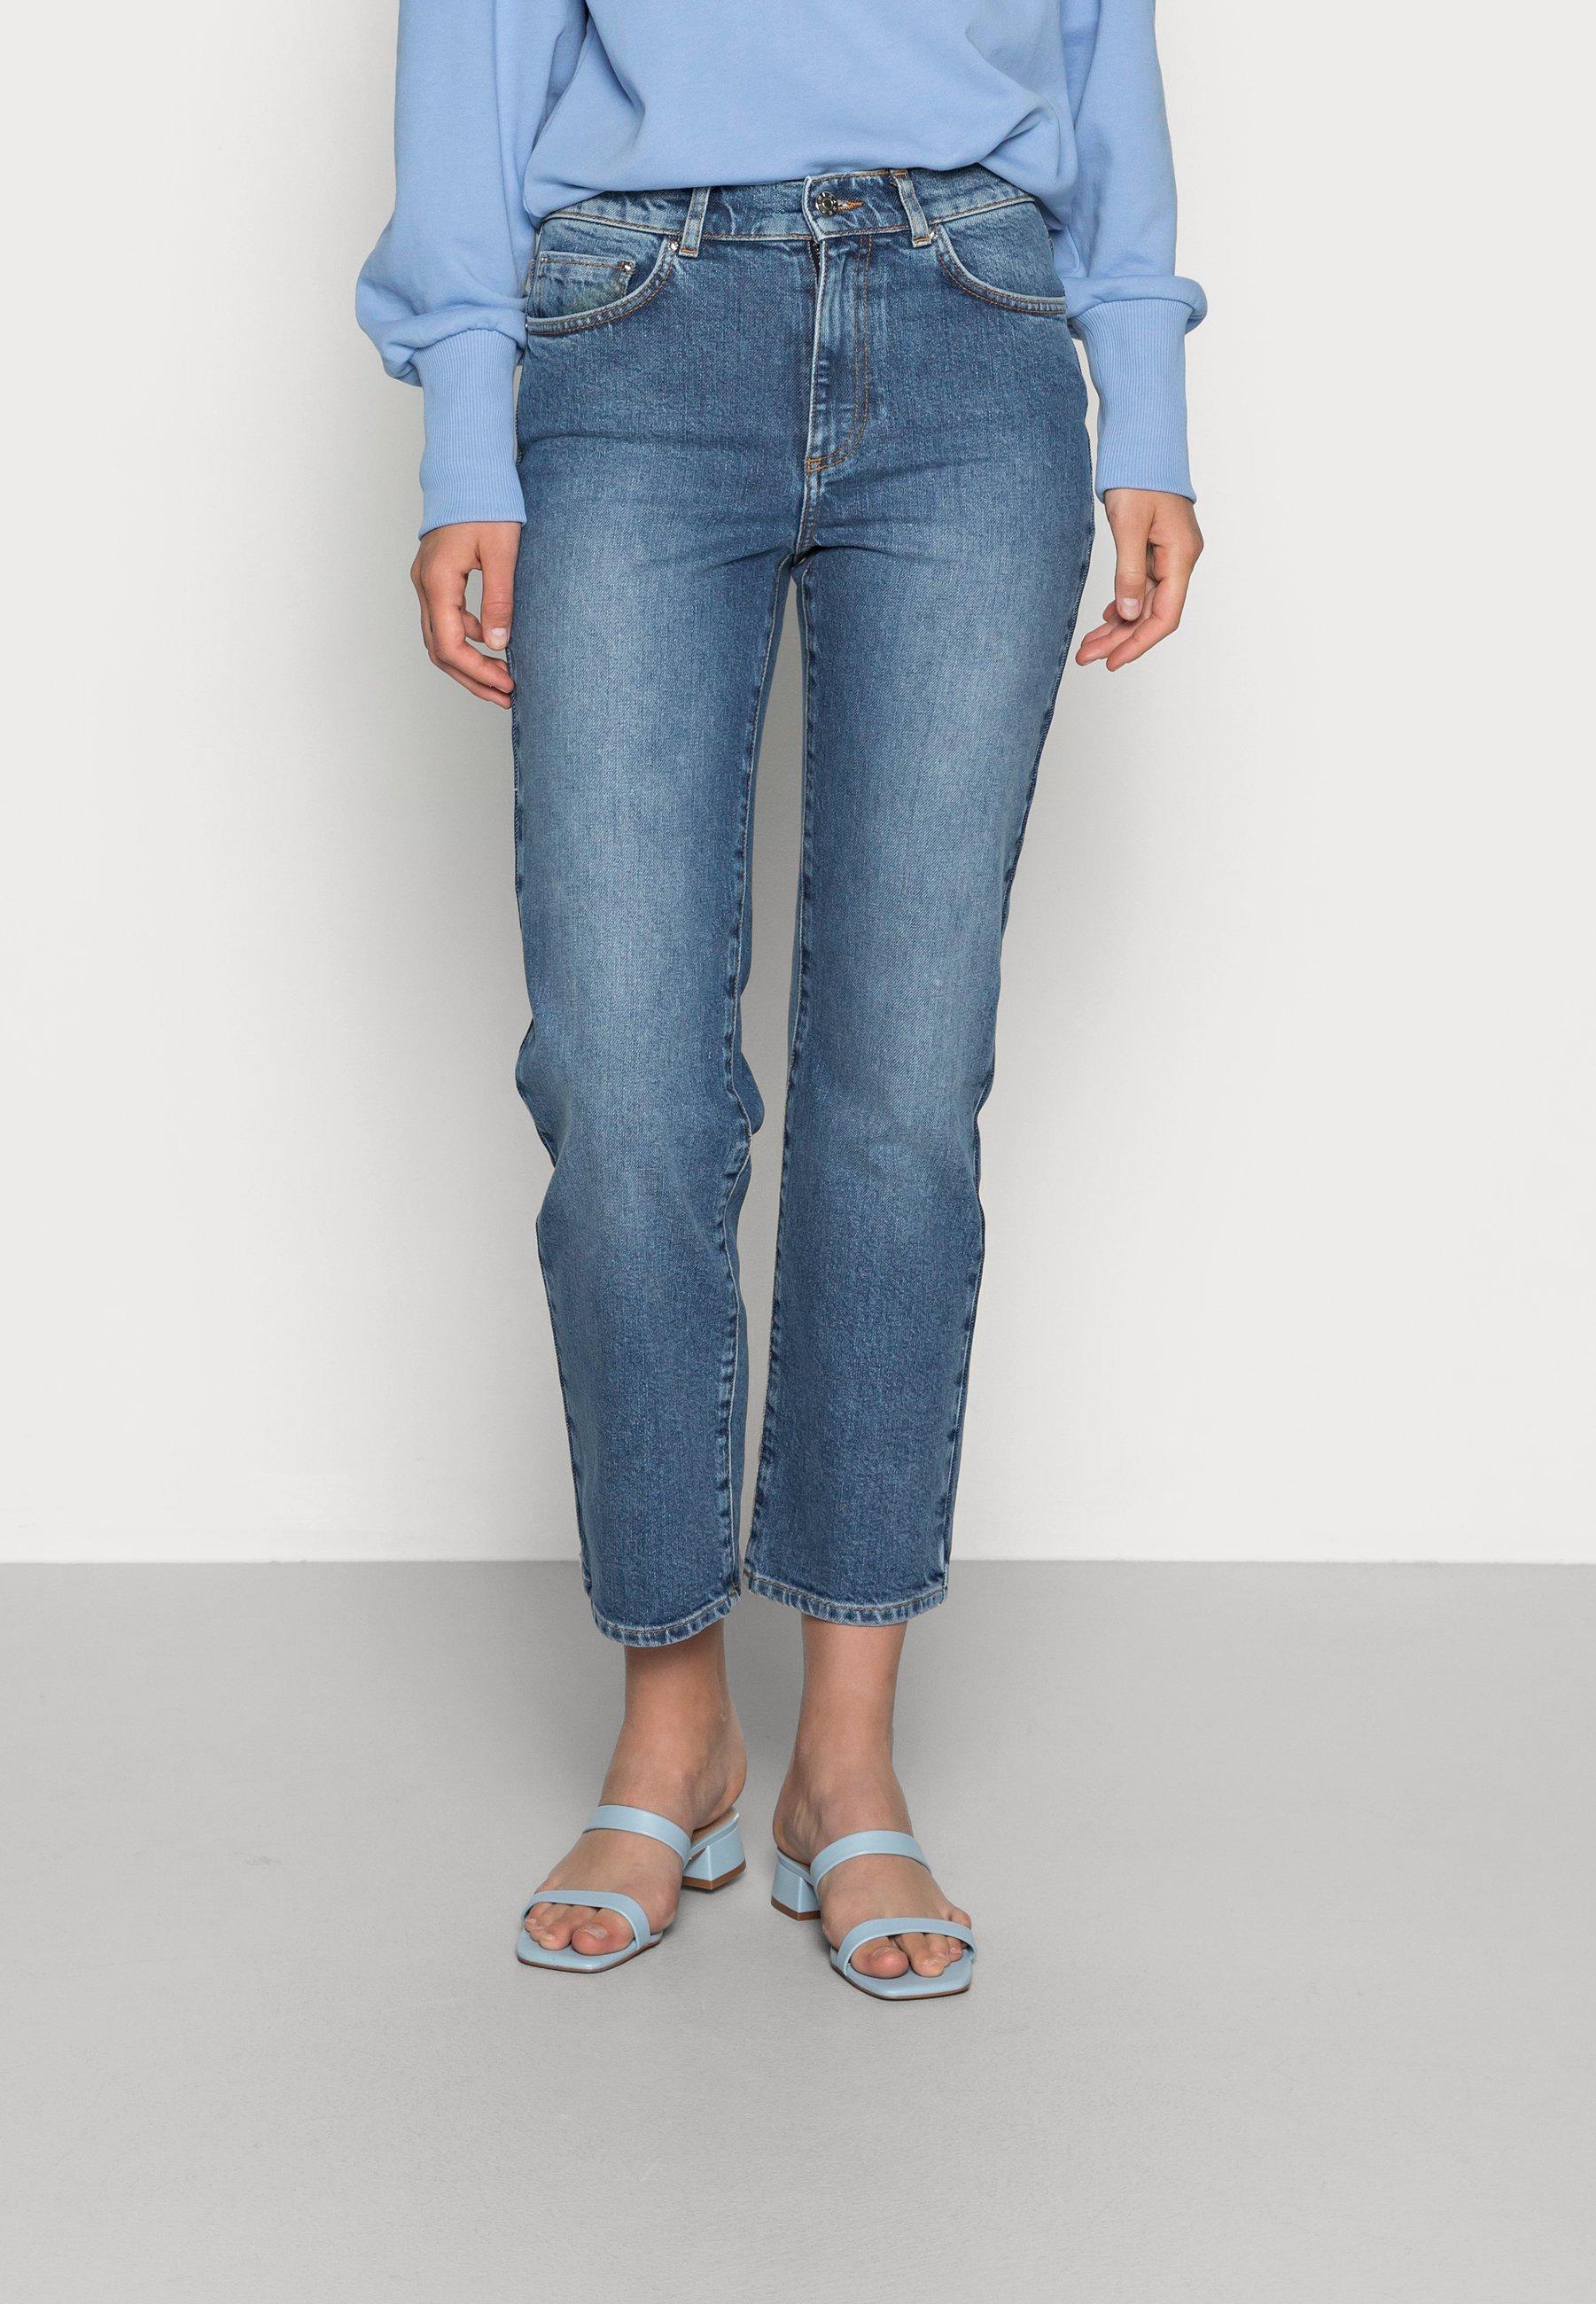 Donna WERA VILDA - Jeans Skinny Fit - denim blue